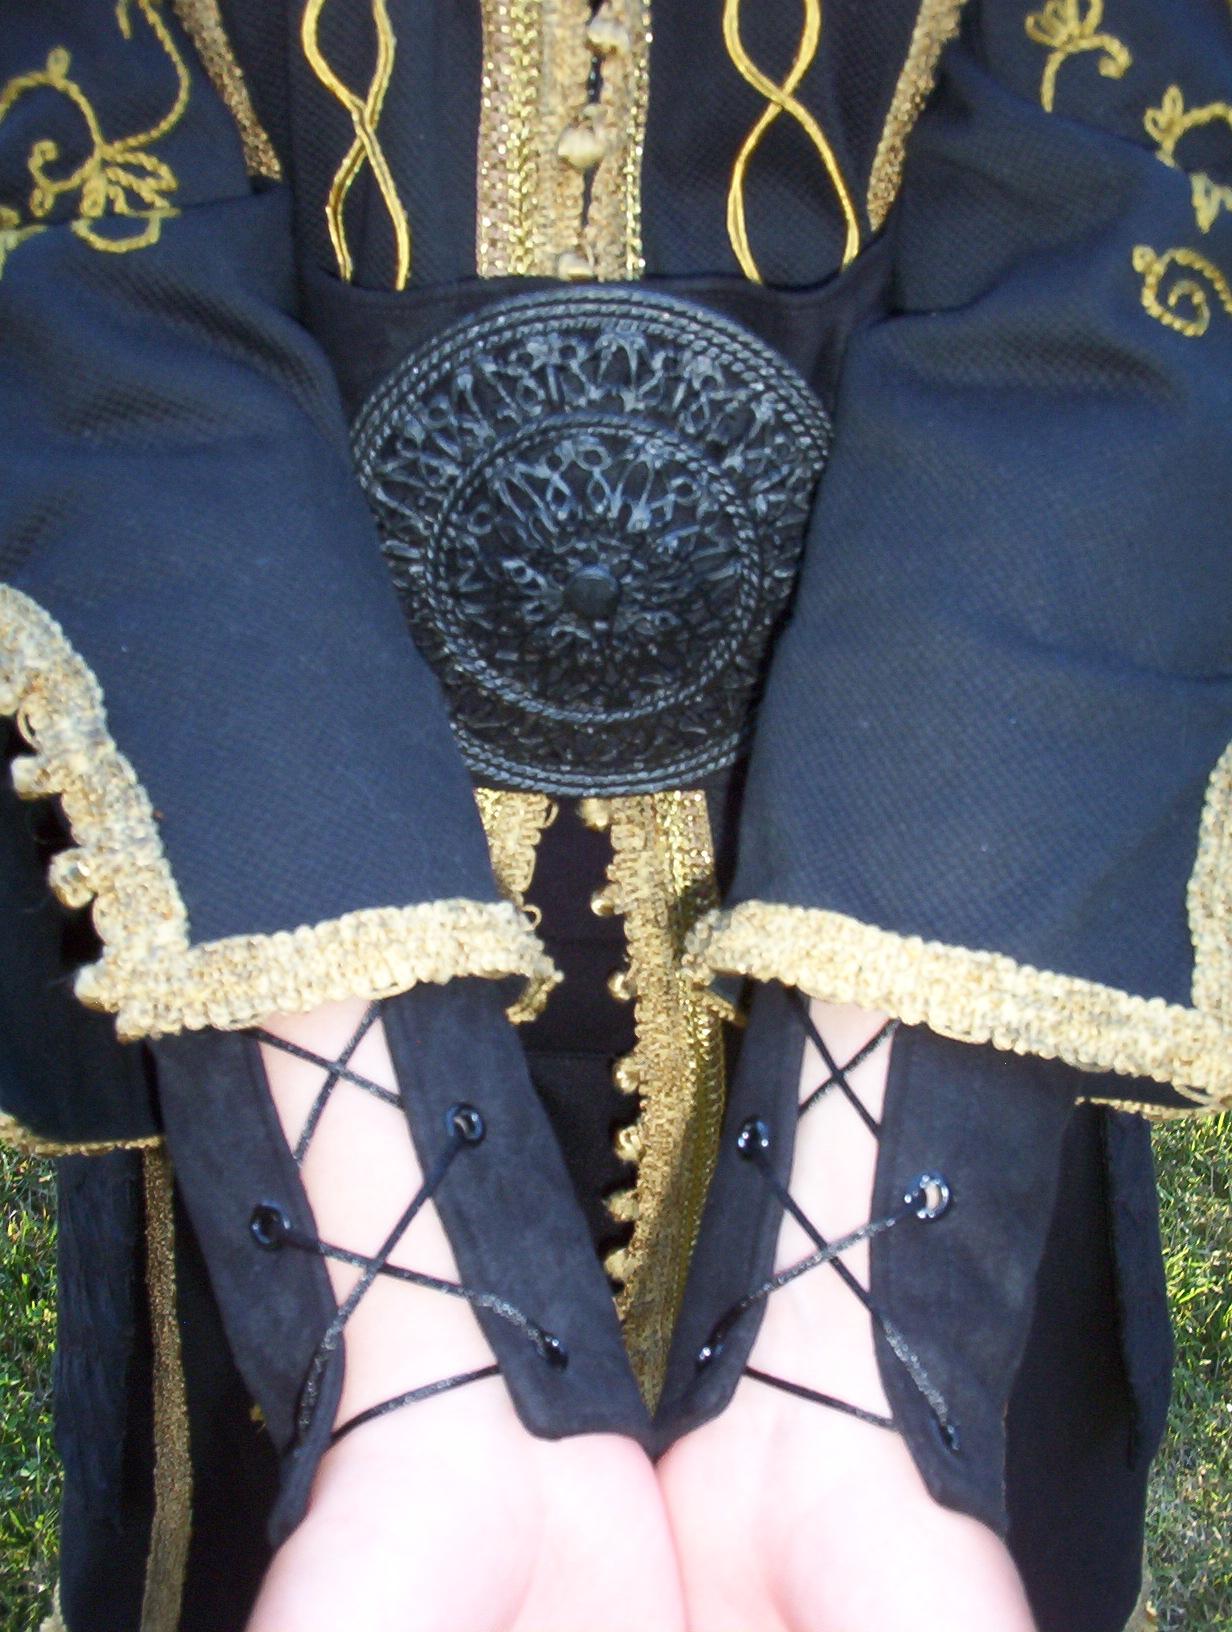 BlackGold Pirate Costume Bekah pics 026.jpg